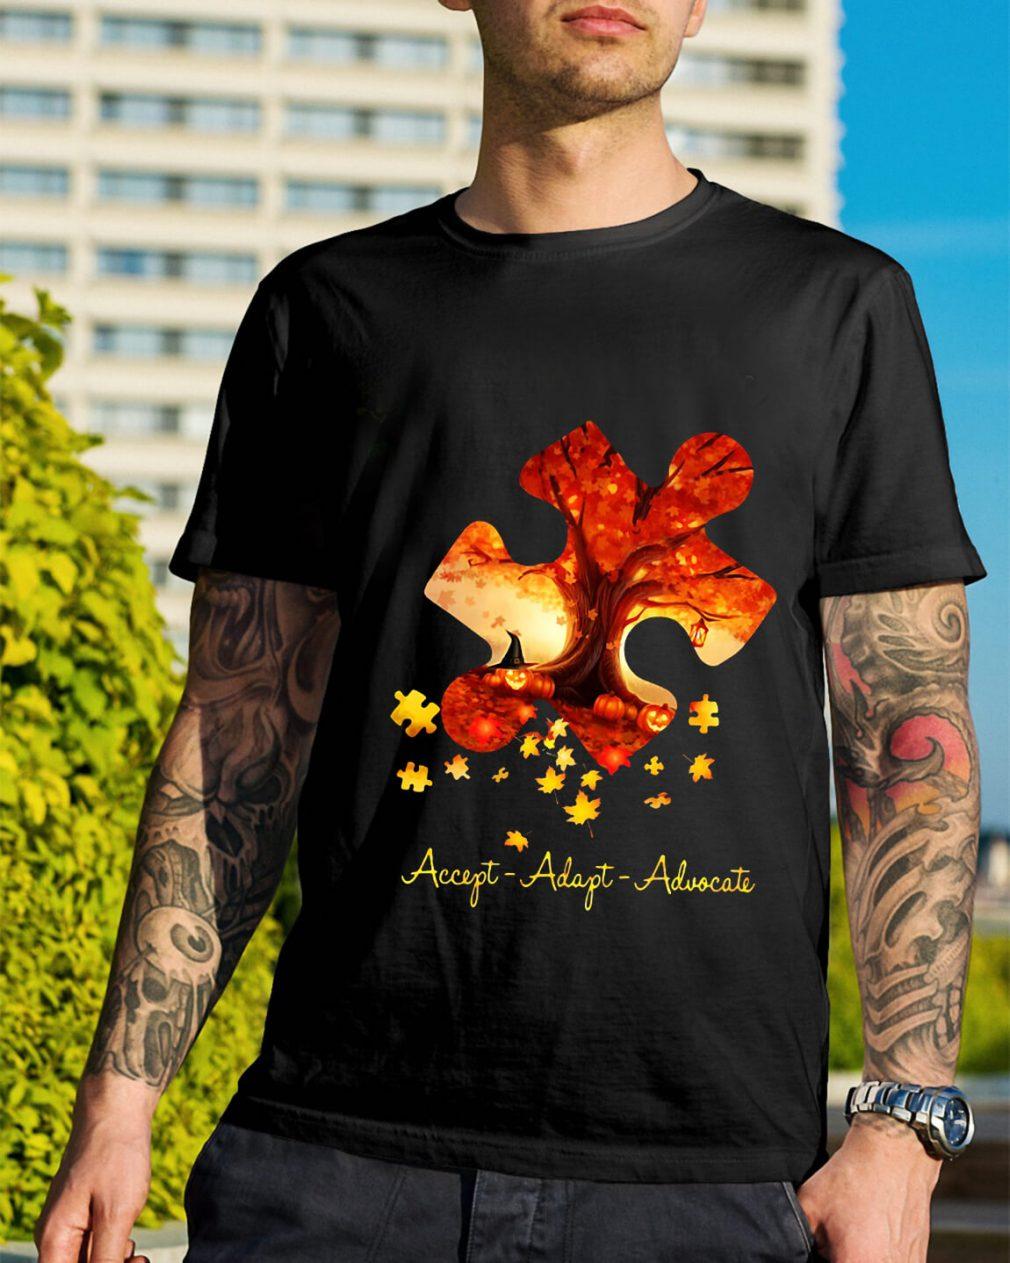 Halloween autism accept adapt advocate shirt